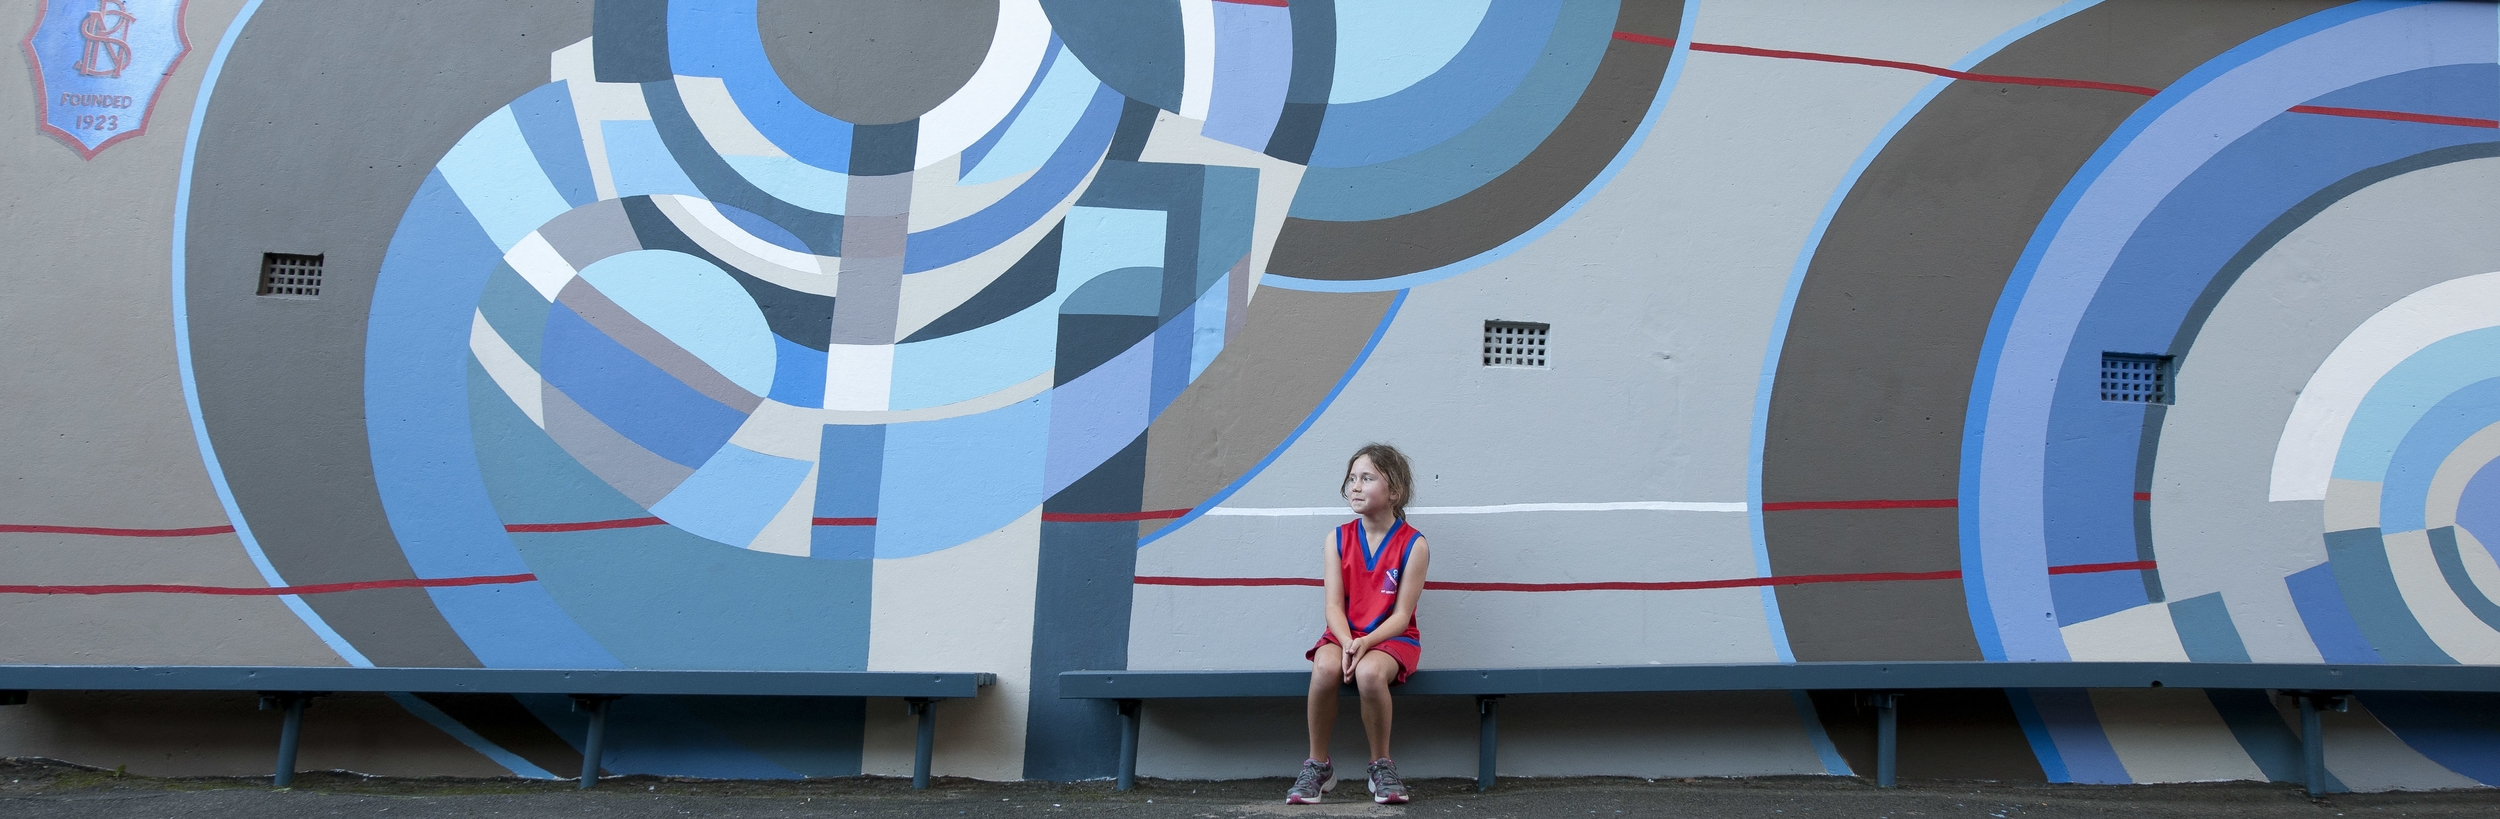 Northbridge Public School, Sydney, Australia.